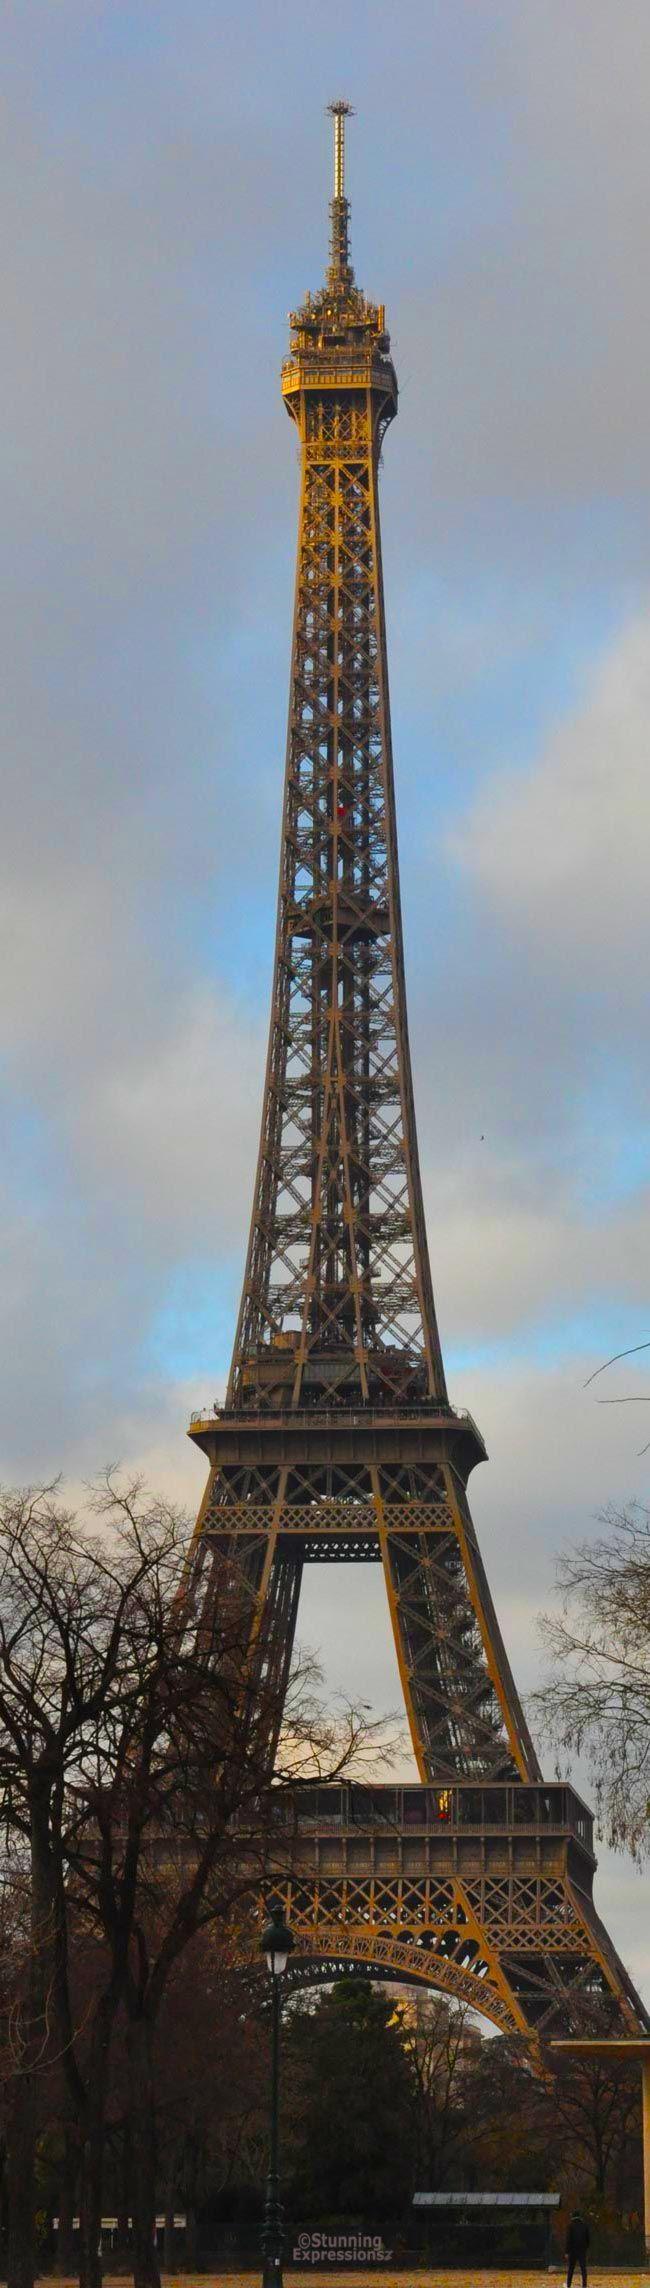 Eiffel Tower - Paris | France